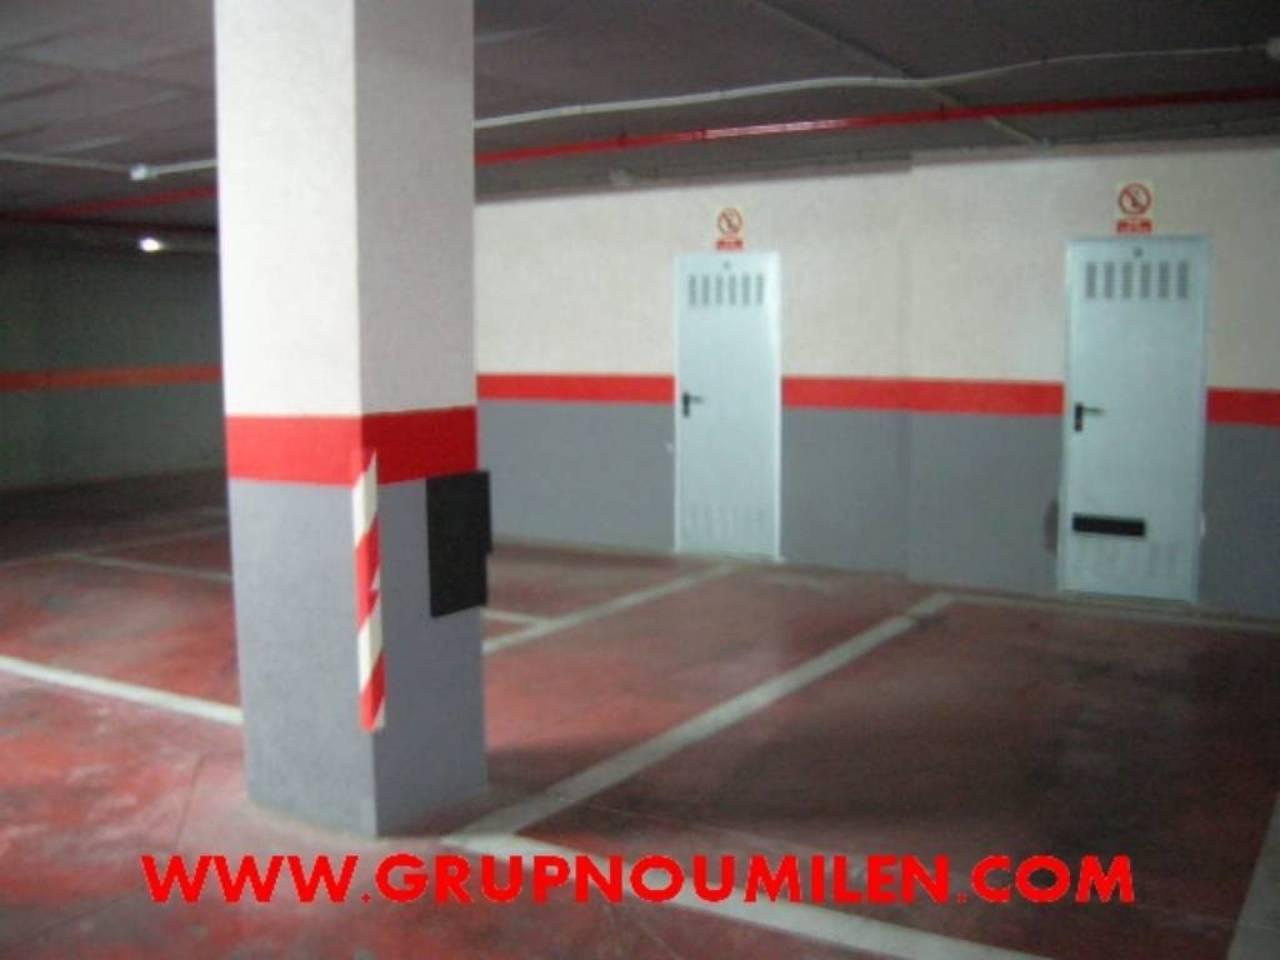 Lloguer Aparcament cotxe  Parc central. Superf. 15 m², 15 plazas, ascensor, varia disponibles.